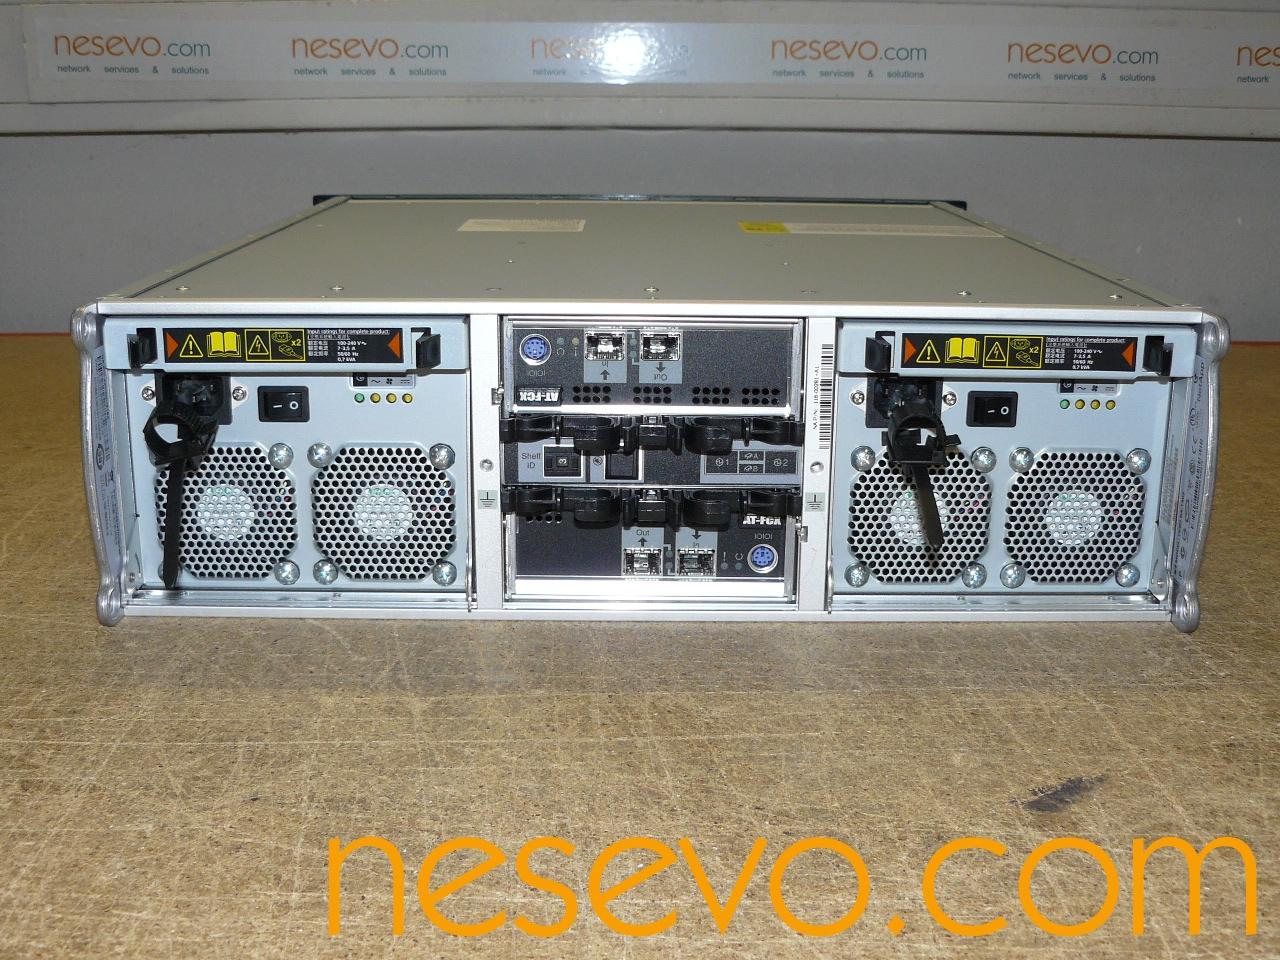 netapp ds14 mk2 at 14x 1tb x269a r5 2x x5612a vat free netto preis ebay